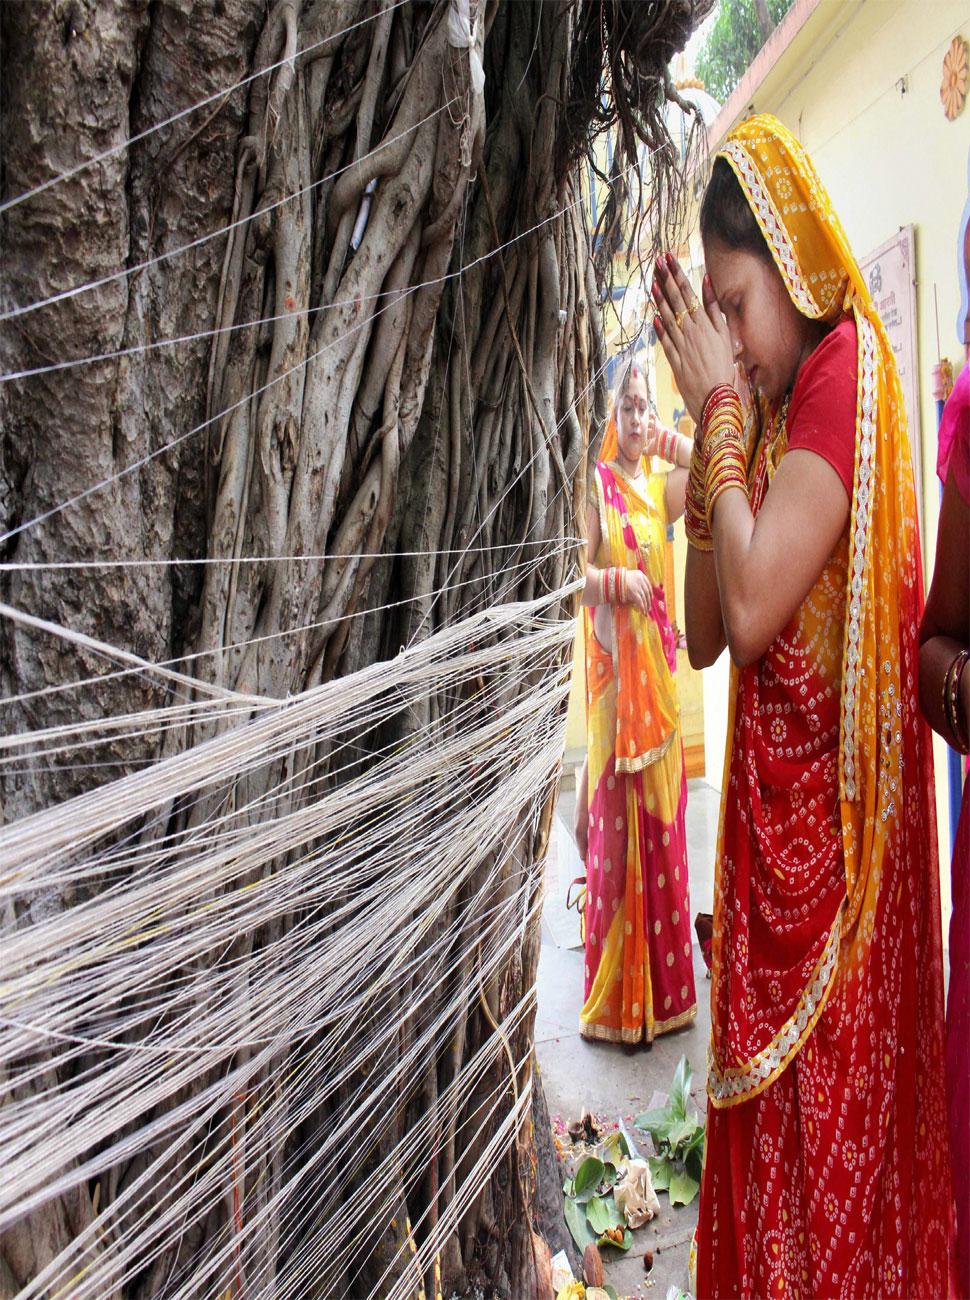 rituals near a Banyan tree during Vat Savitri Puja